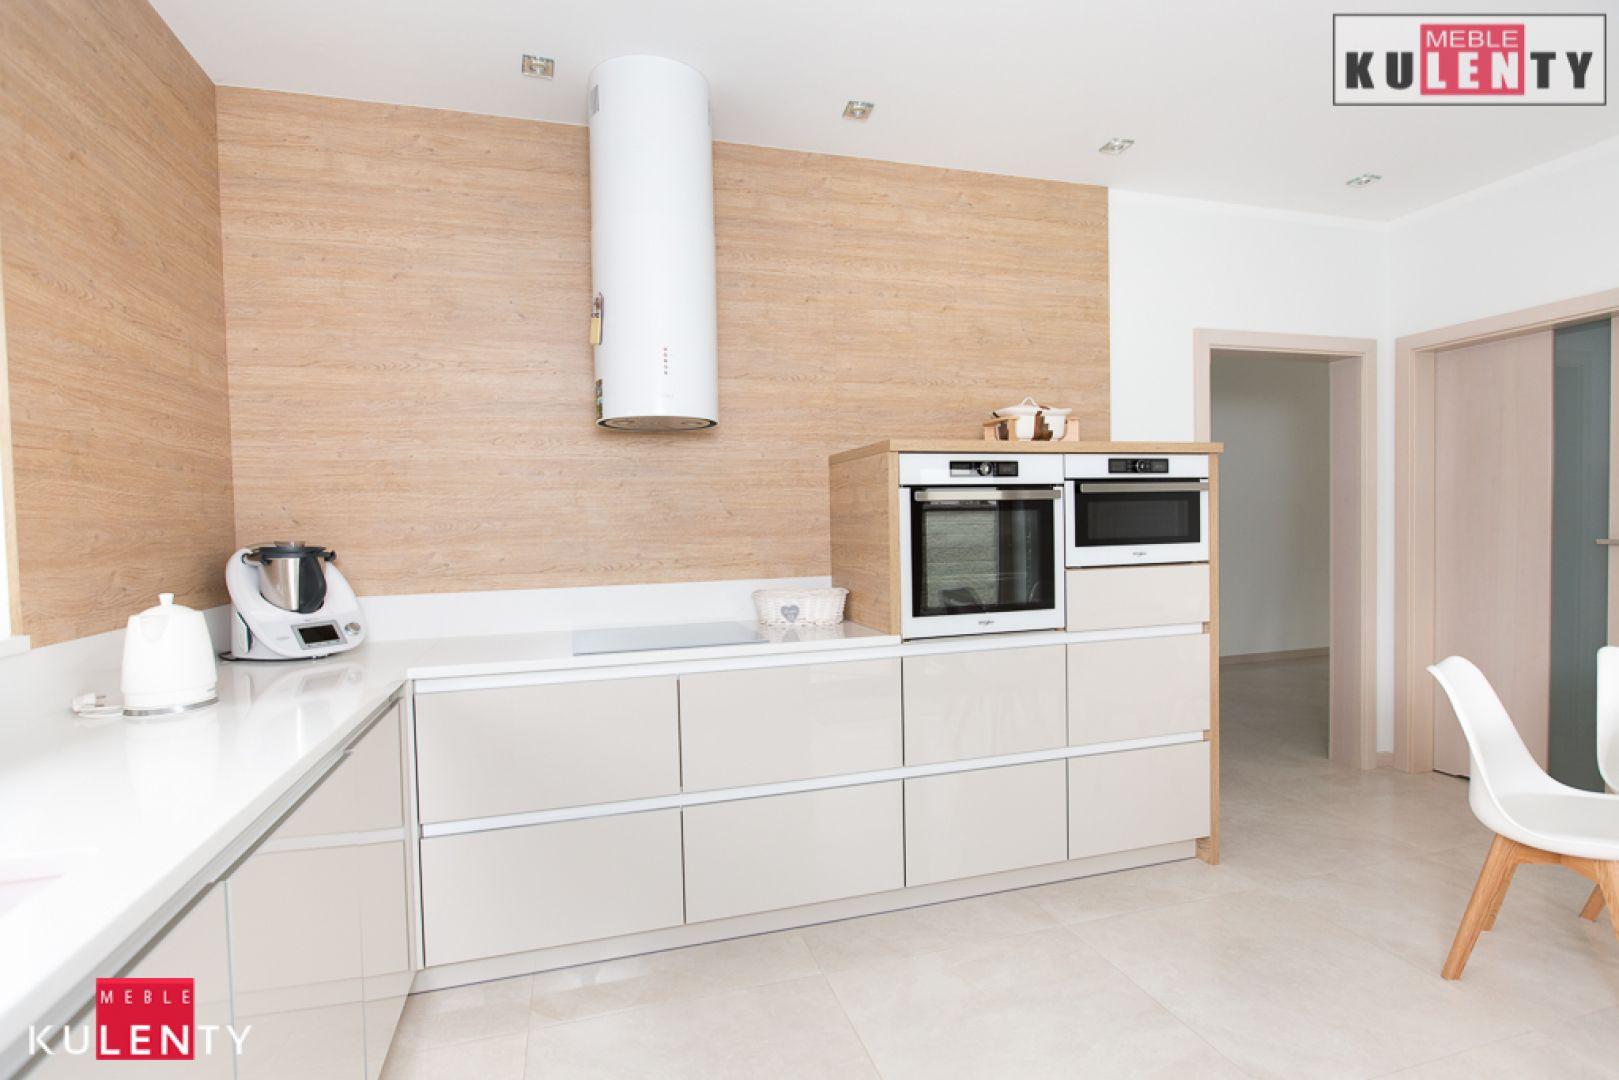 Biały blat w kuchni CJYQ